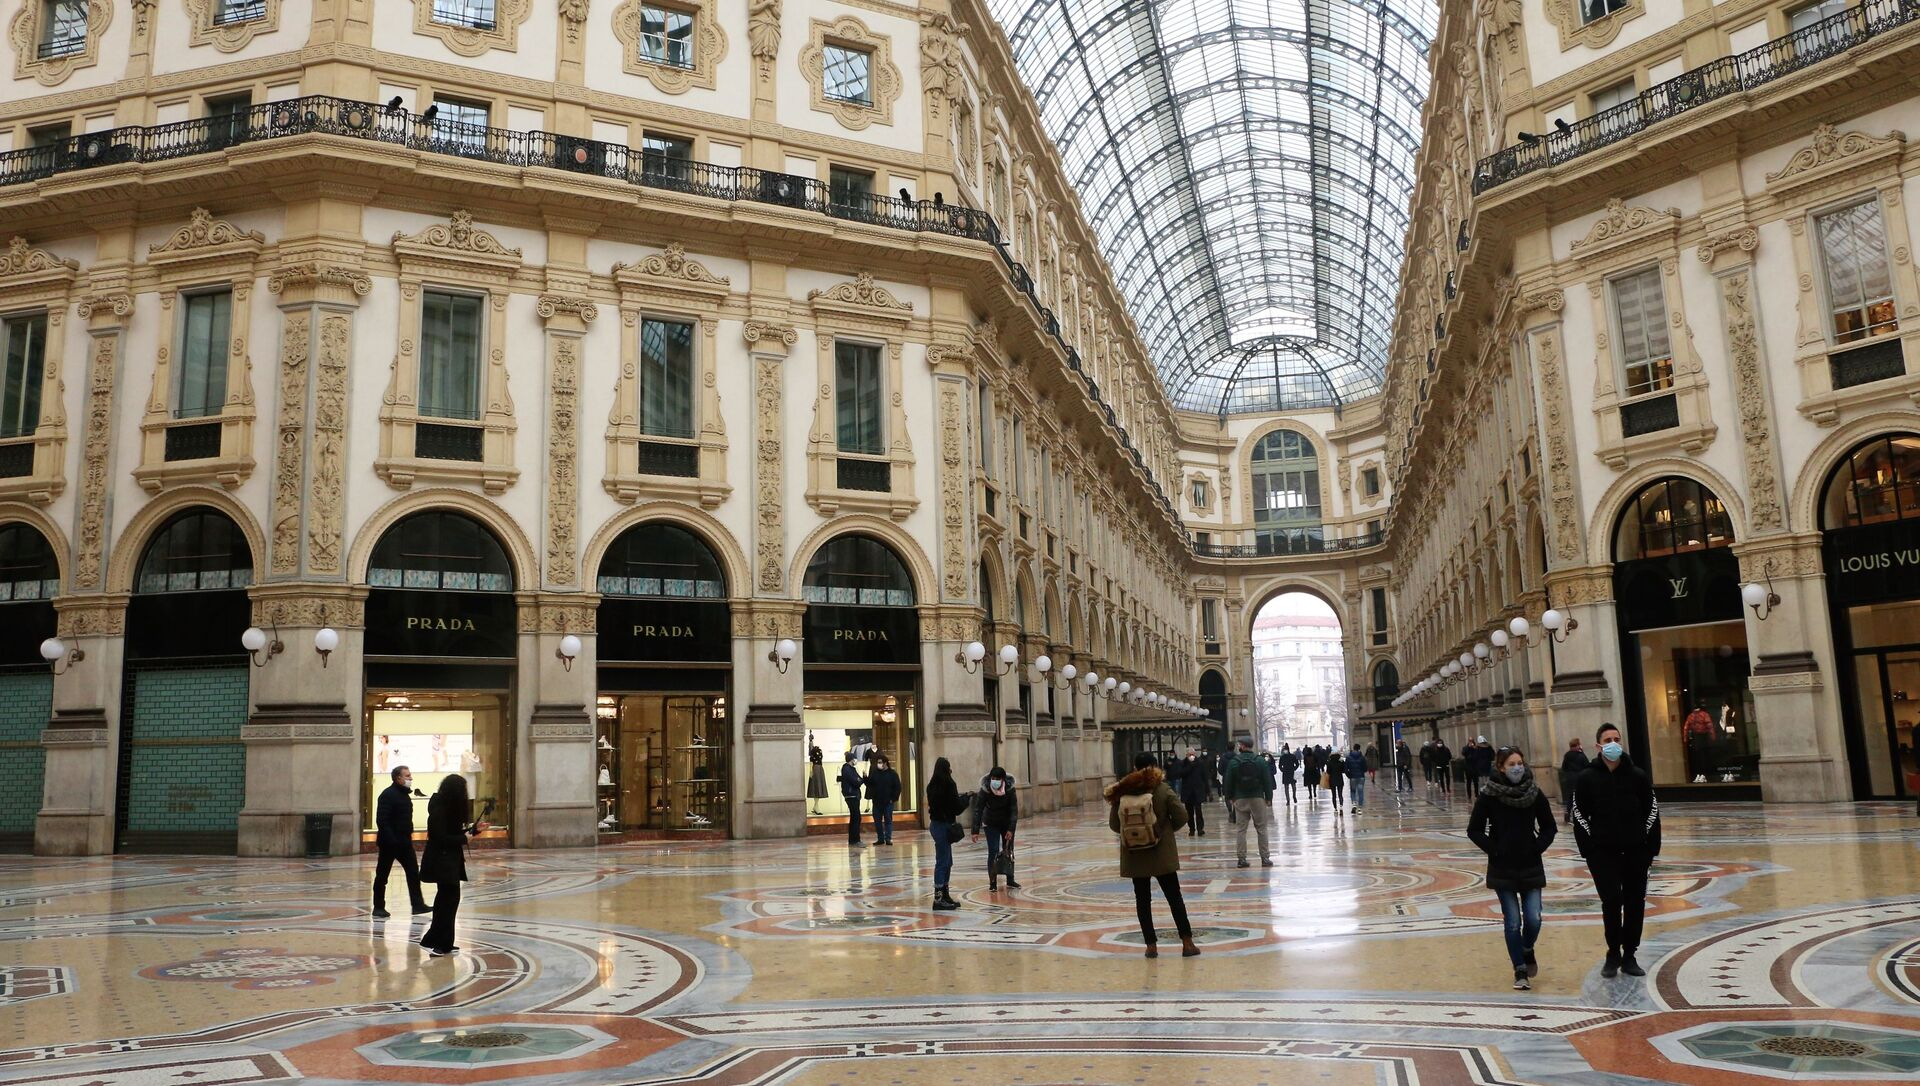 La galleria Vittorio Emanuele II semi-deserta a Milano, Italia - Sputnik Italia, 1920, 09.03.2021